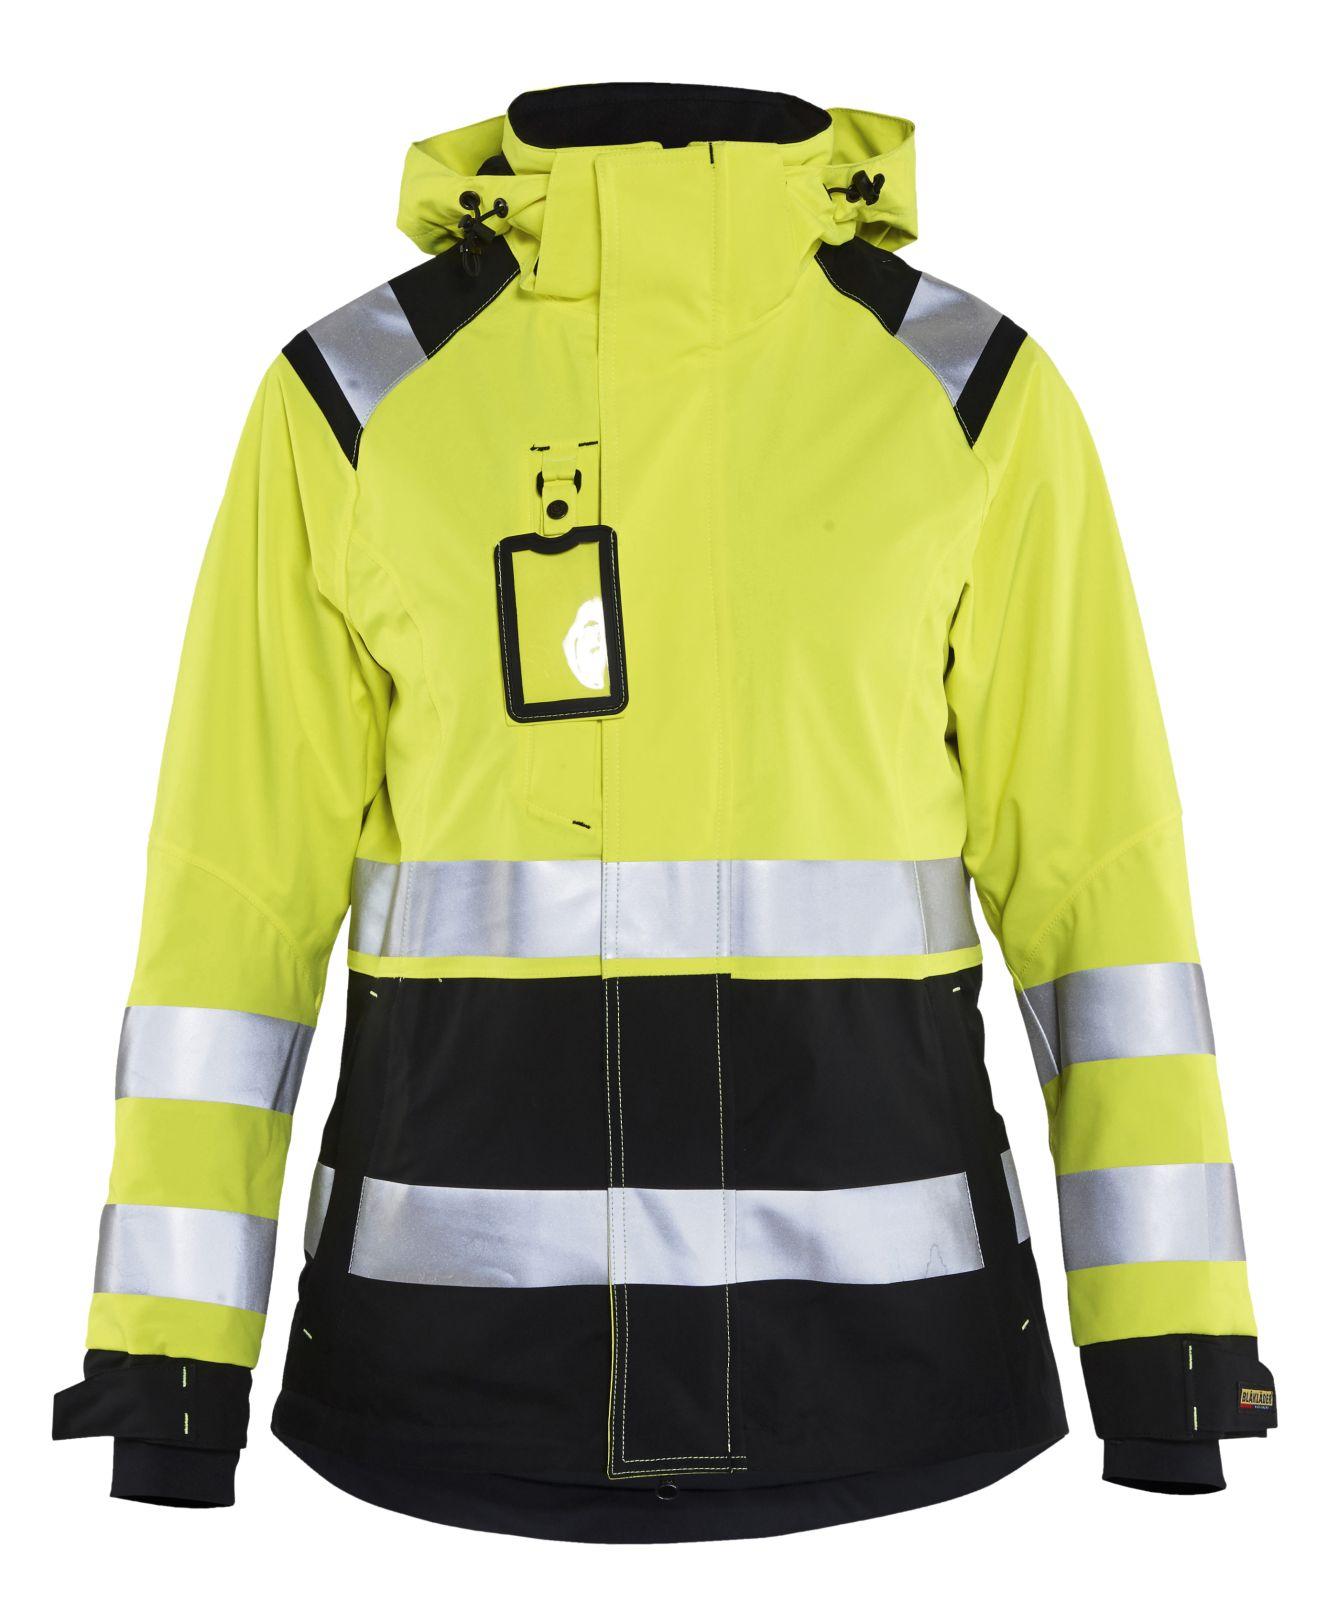 Blaklader Dames regenjacks 49041987 High Vis geel-zwart(3399)